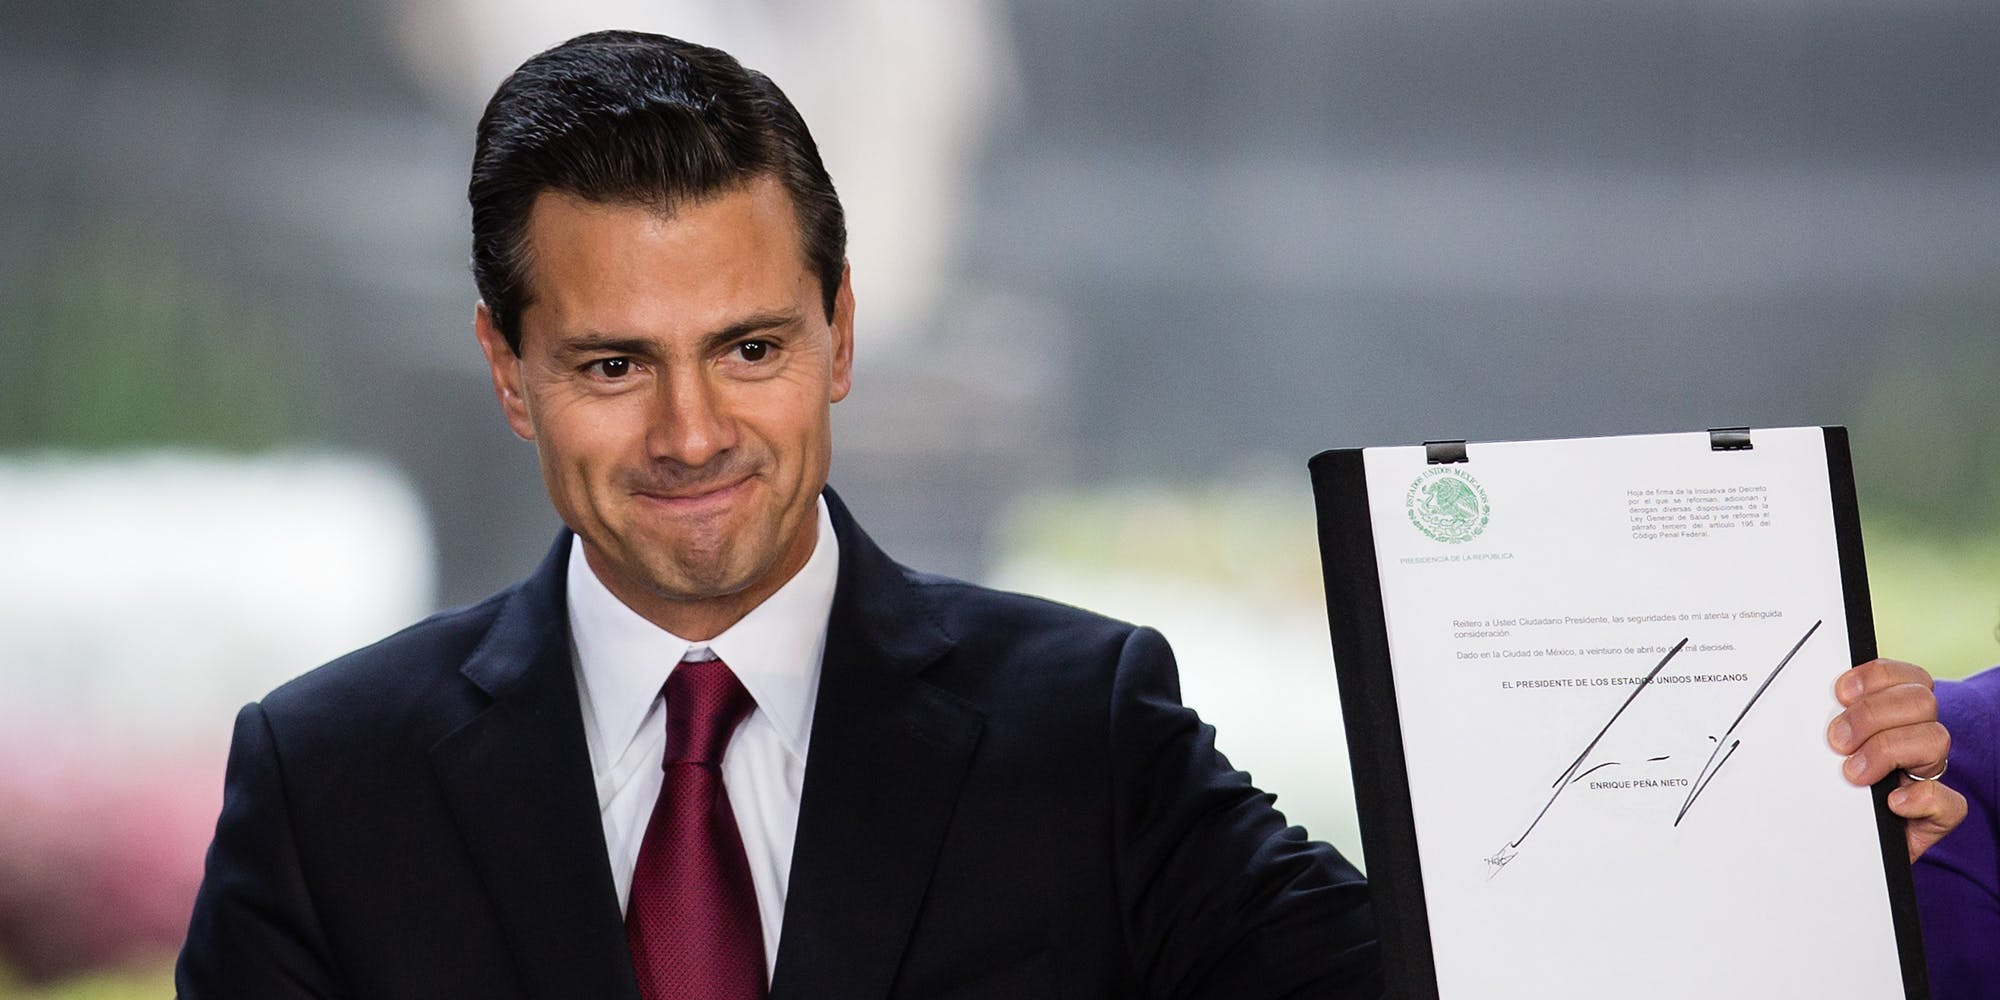 Mexico's Supreme Court Considers Legalizing Marijuana